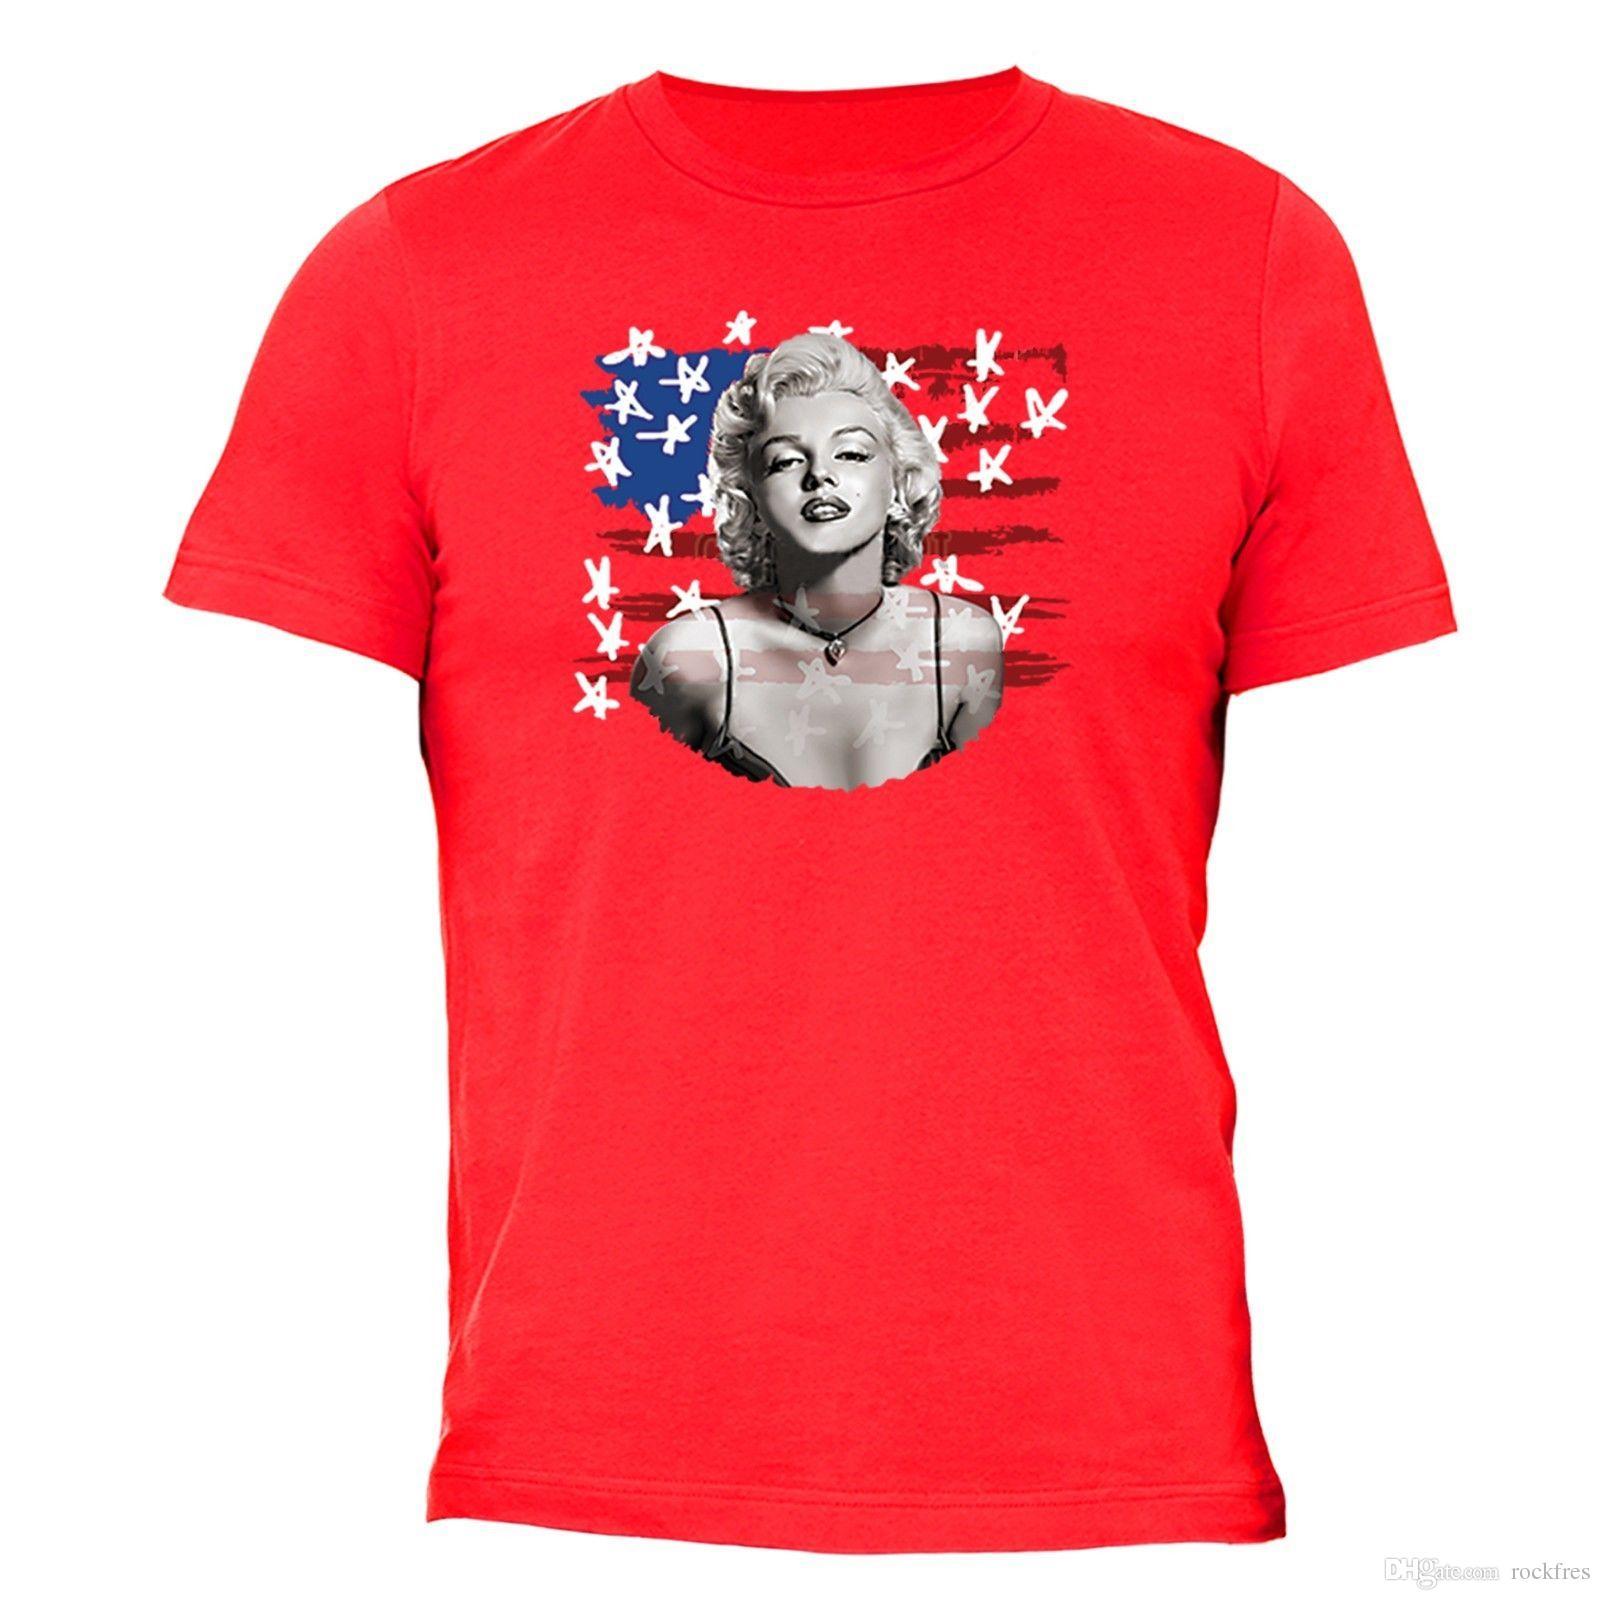 18038eaf7d8e7 Marilyn Monroe Tshirt Bikini Flag 4th Of July Clothing American Flag USA T  Shirt Best Deal On T Shirts That T Shirt From Rockfres, $10.19| DHgate.Com